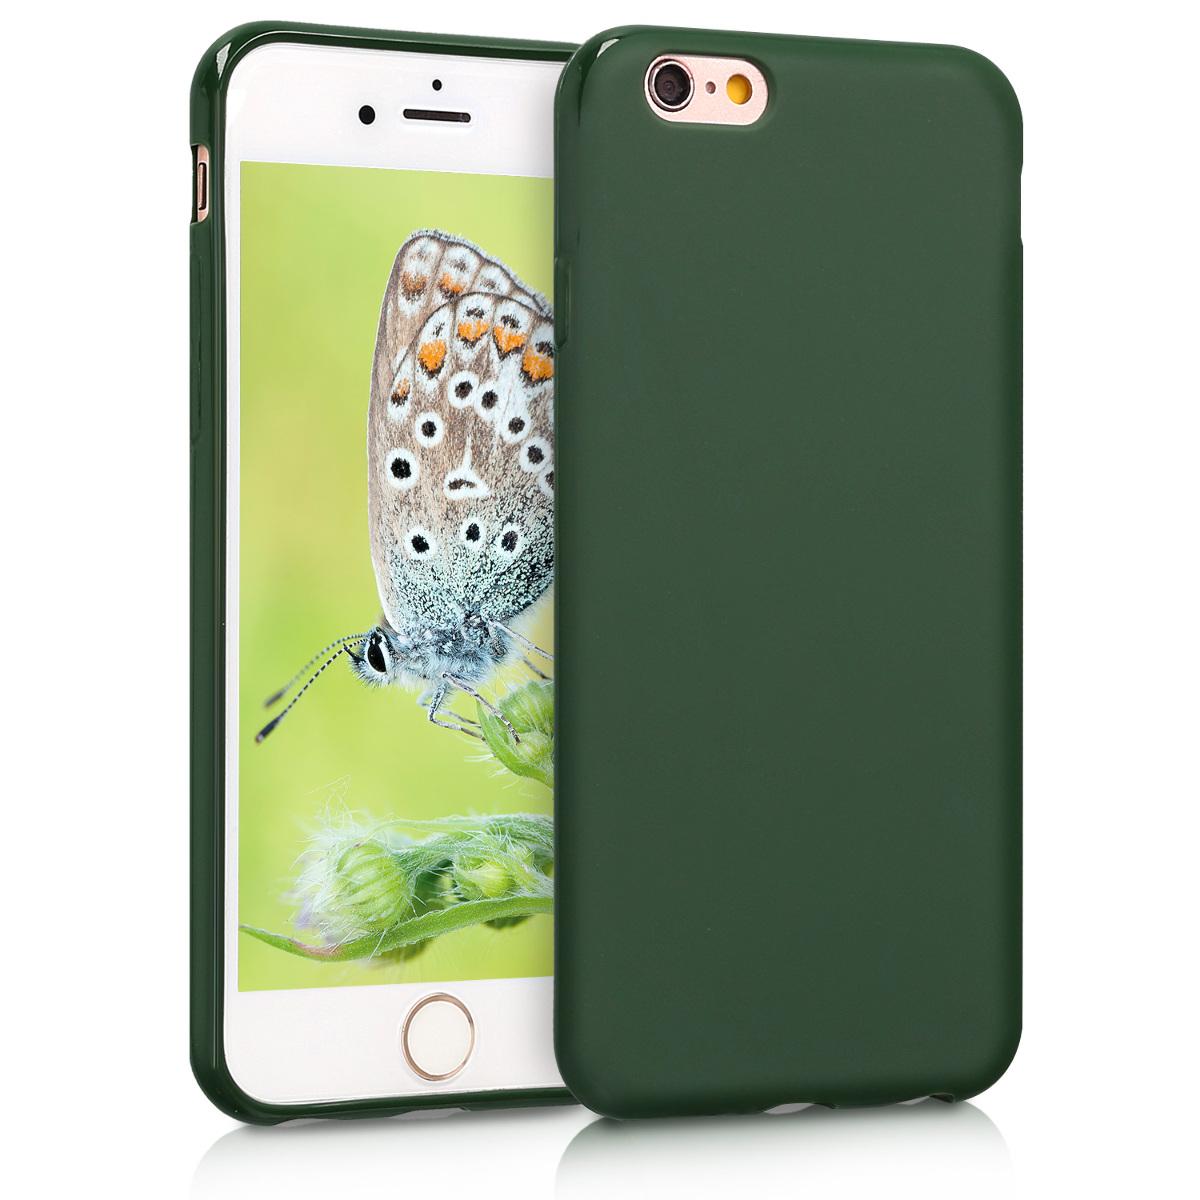 KW Θήκη Σιλικόνης iPhone 6 / 6S - Dark Green Matte (35176.80)